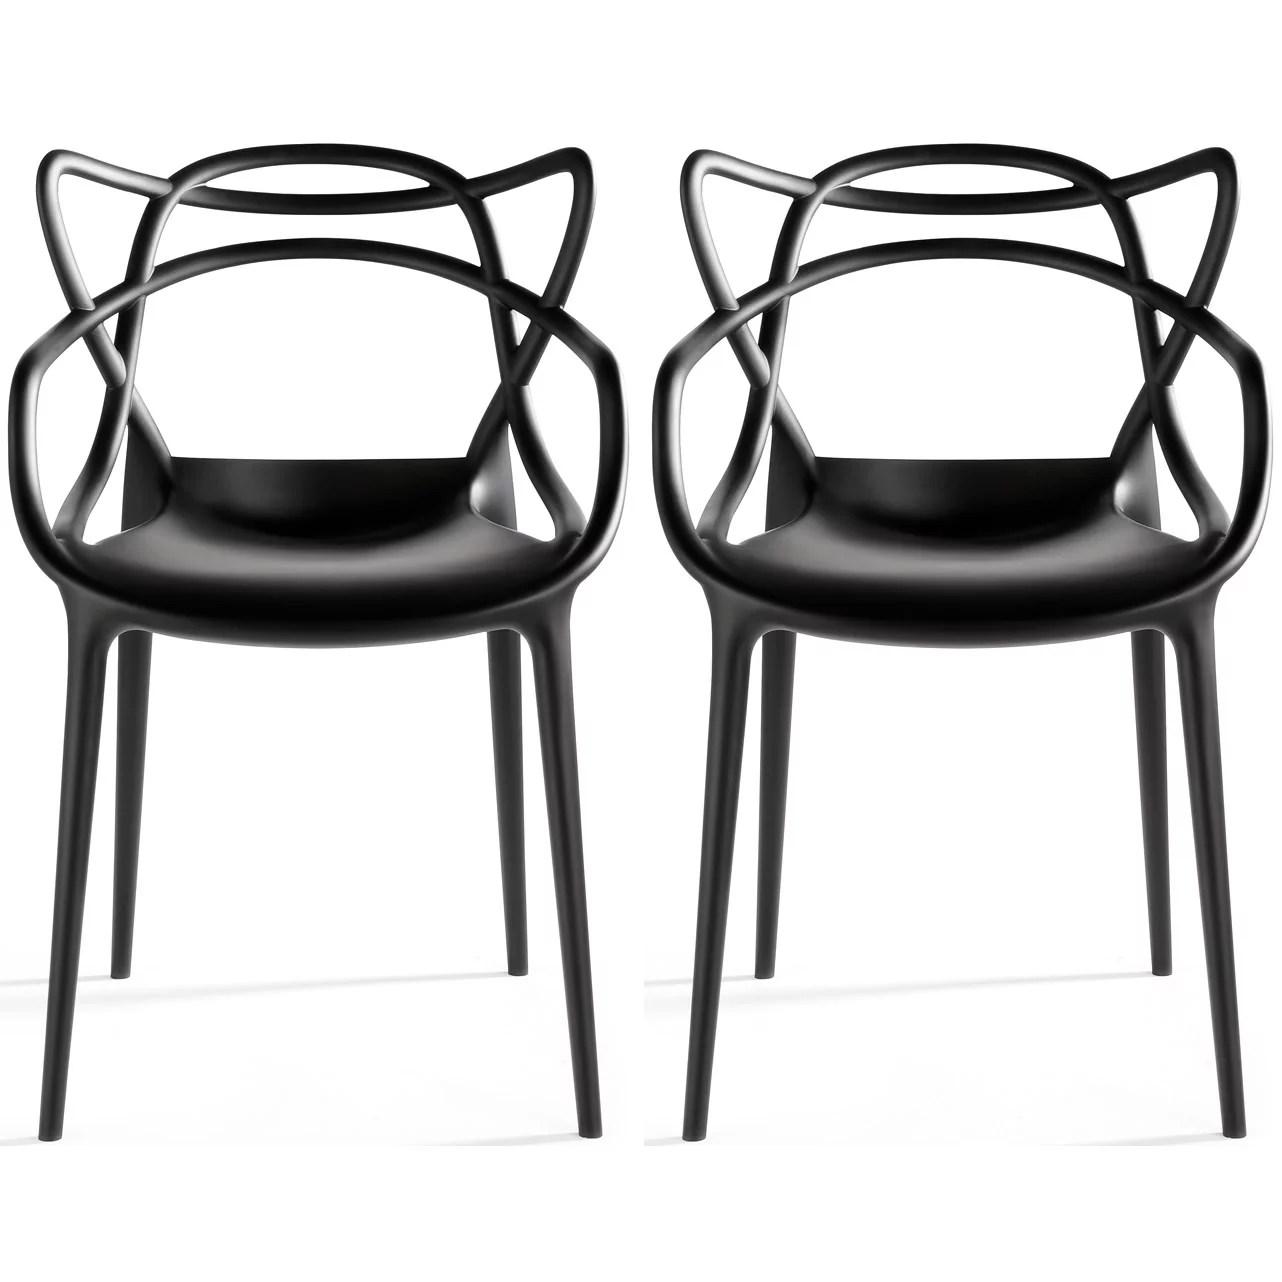 plastic lawn chairs black walmart com